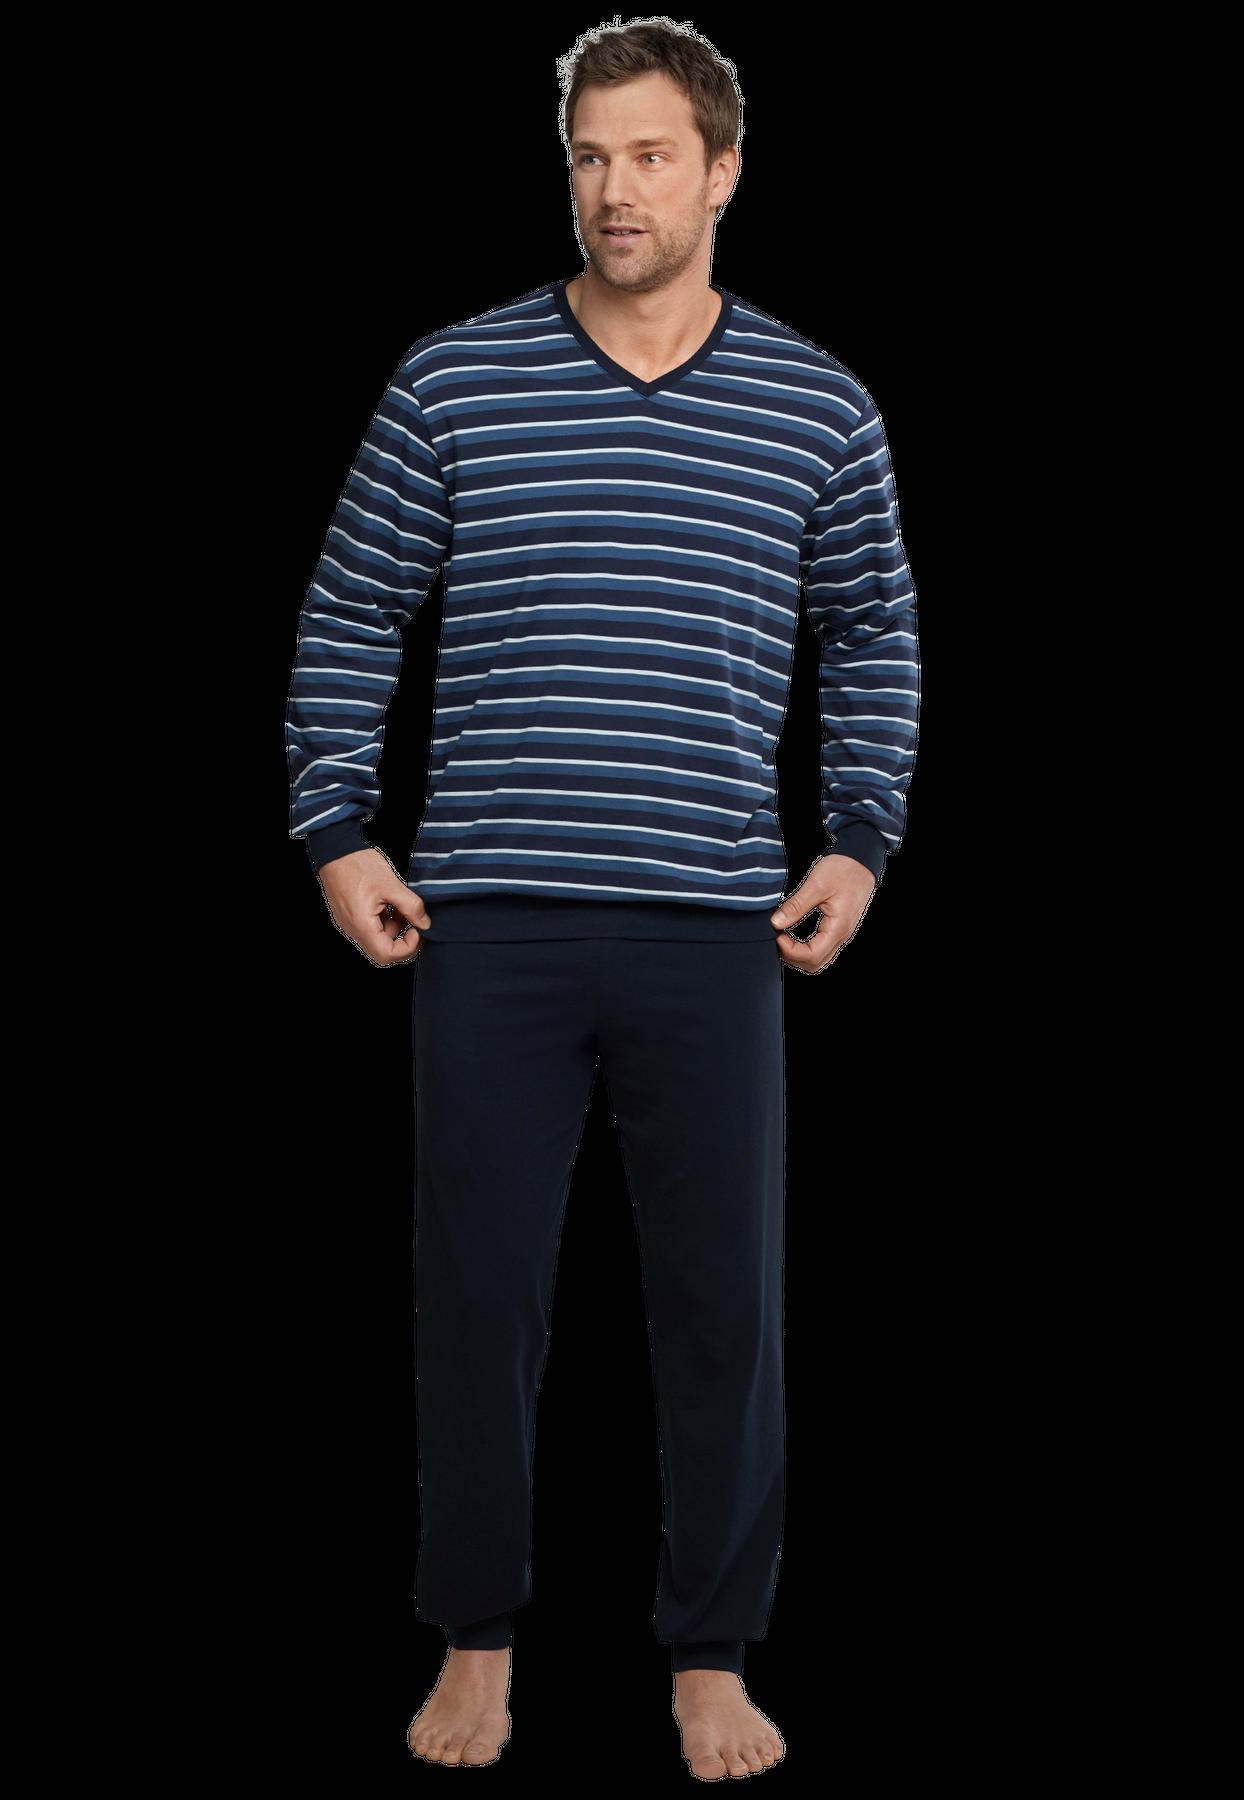 Seidensticker - Herren Pyjama lang, blau (159002) – Bild 1